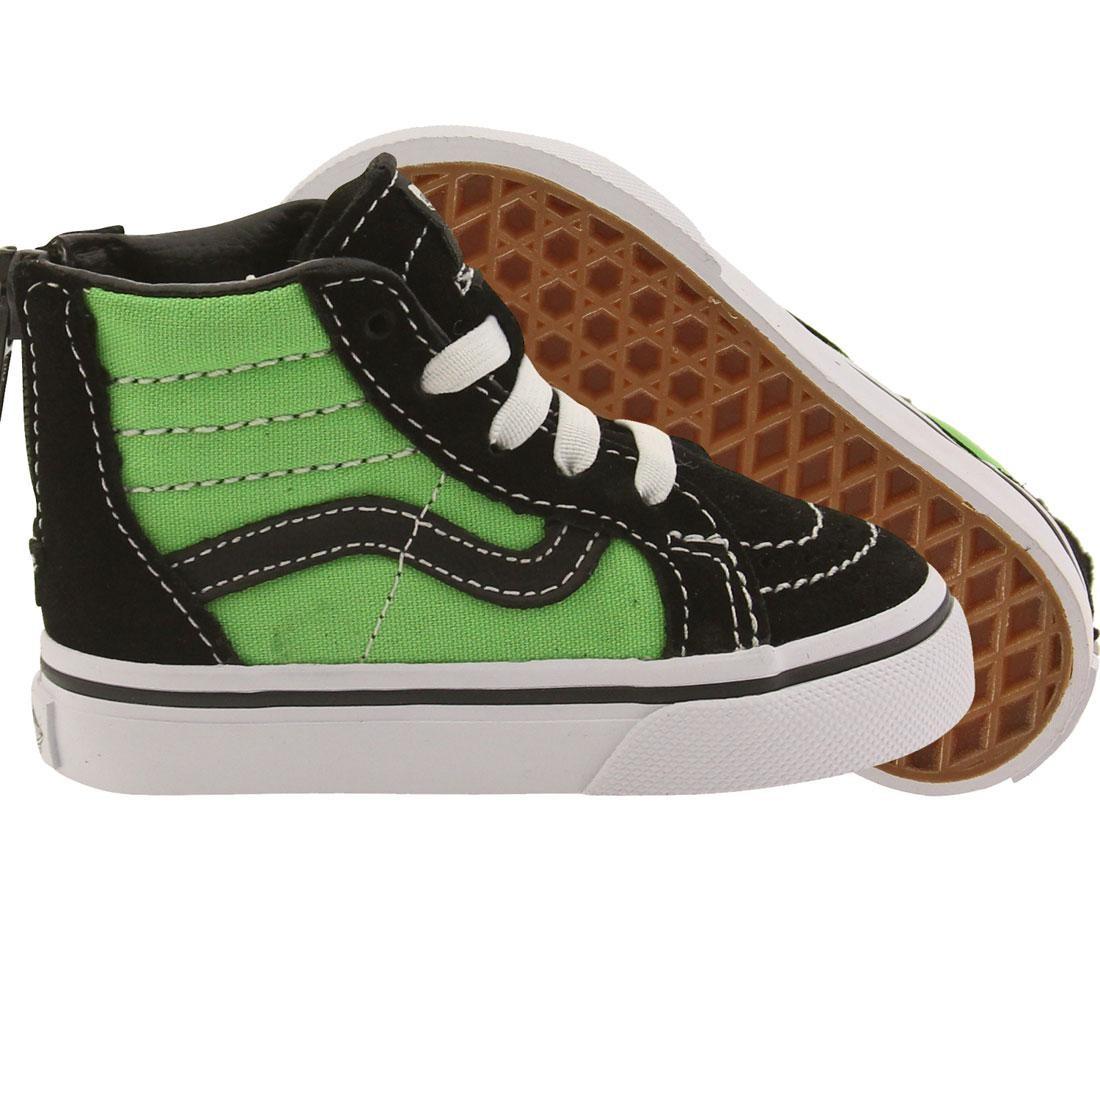 Vans Toddlers Sk8-Hi Zip (black / green)